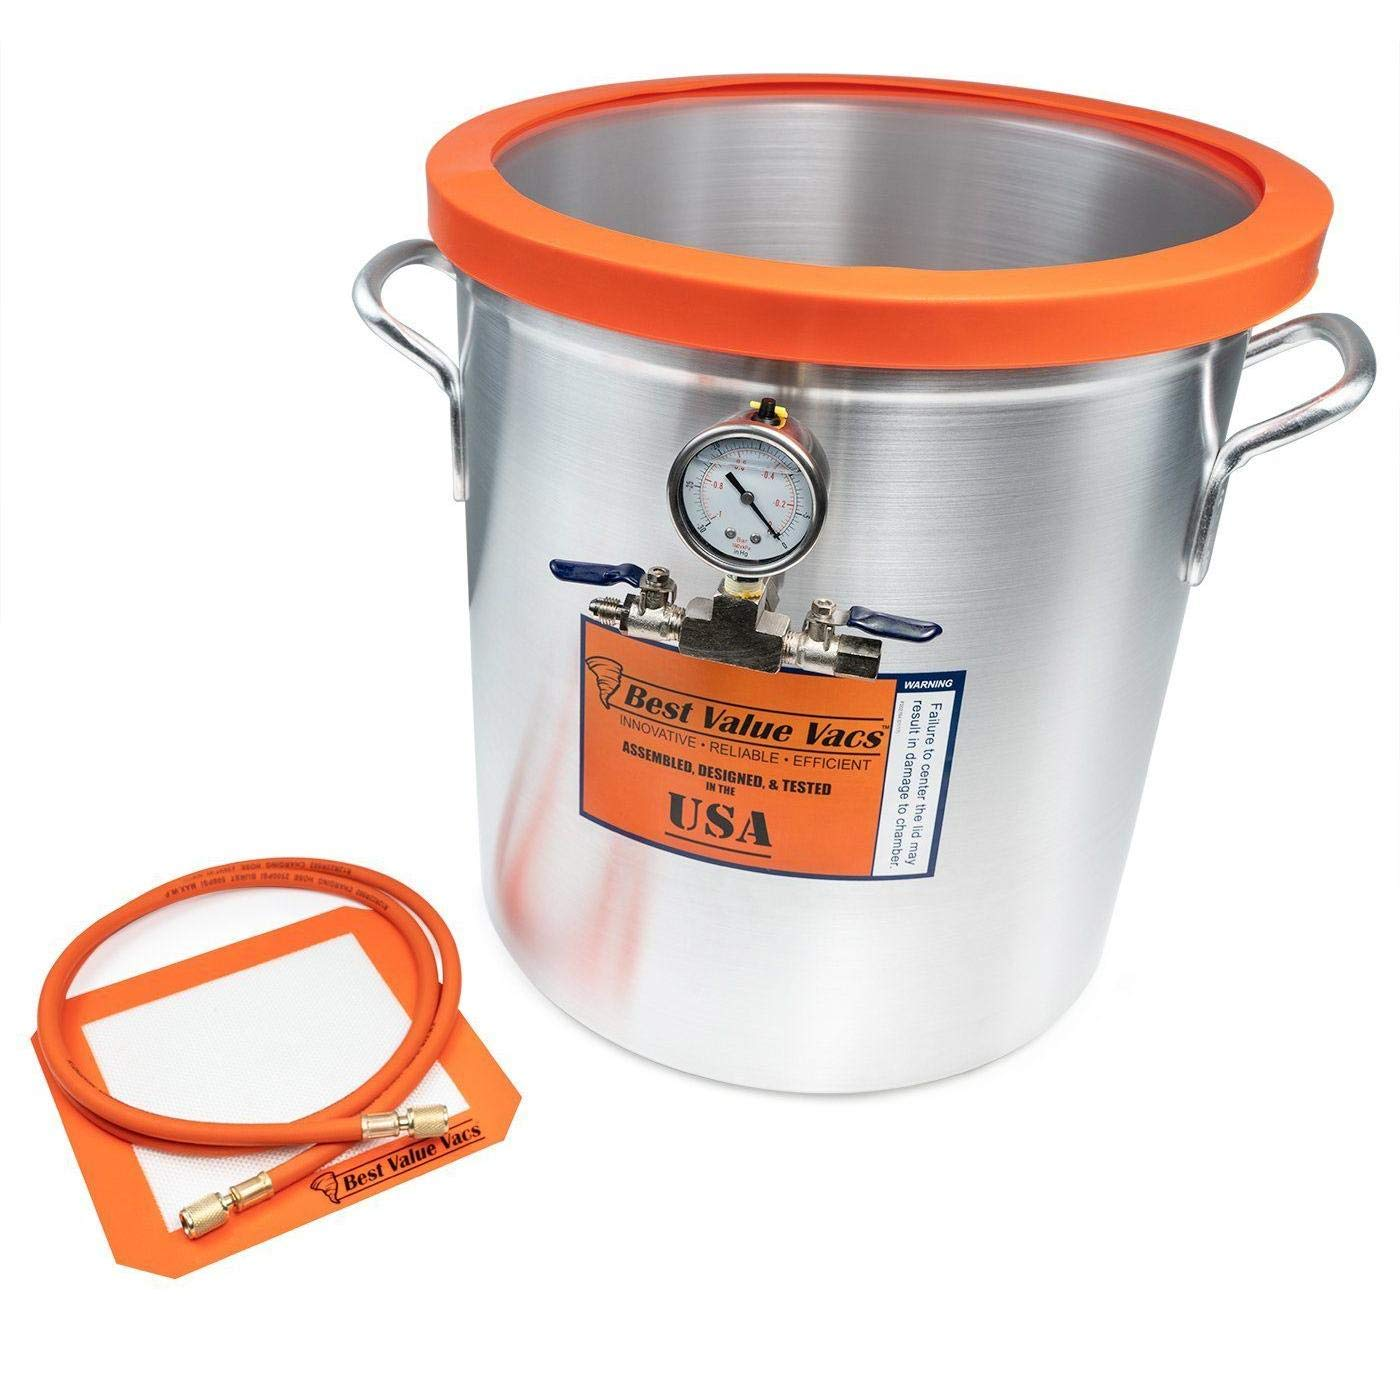 Best Value Vacs 10 Gallon Aluminum Side Mount Vacuum Chamber